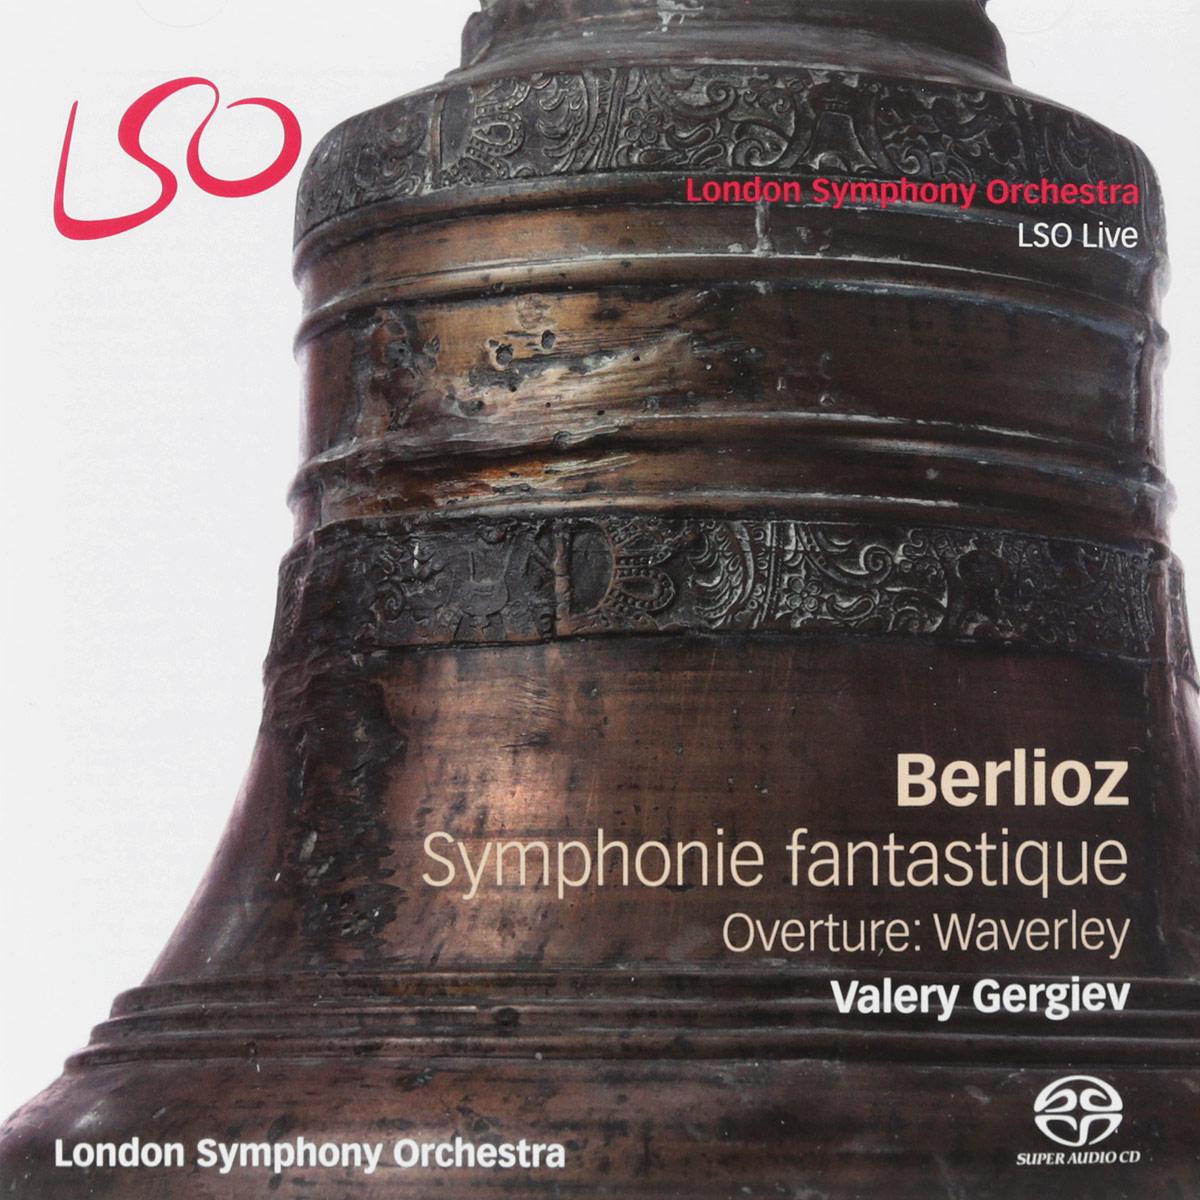 Валерий Гергиев,The London Symphony Orchestra Valery Gergiev. Berlioz. Symphonie Fantastique / Overture: Waverley (SACD + Blu-ray)